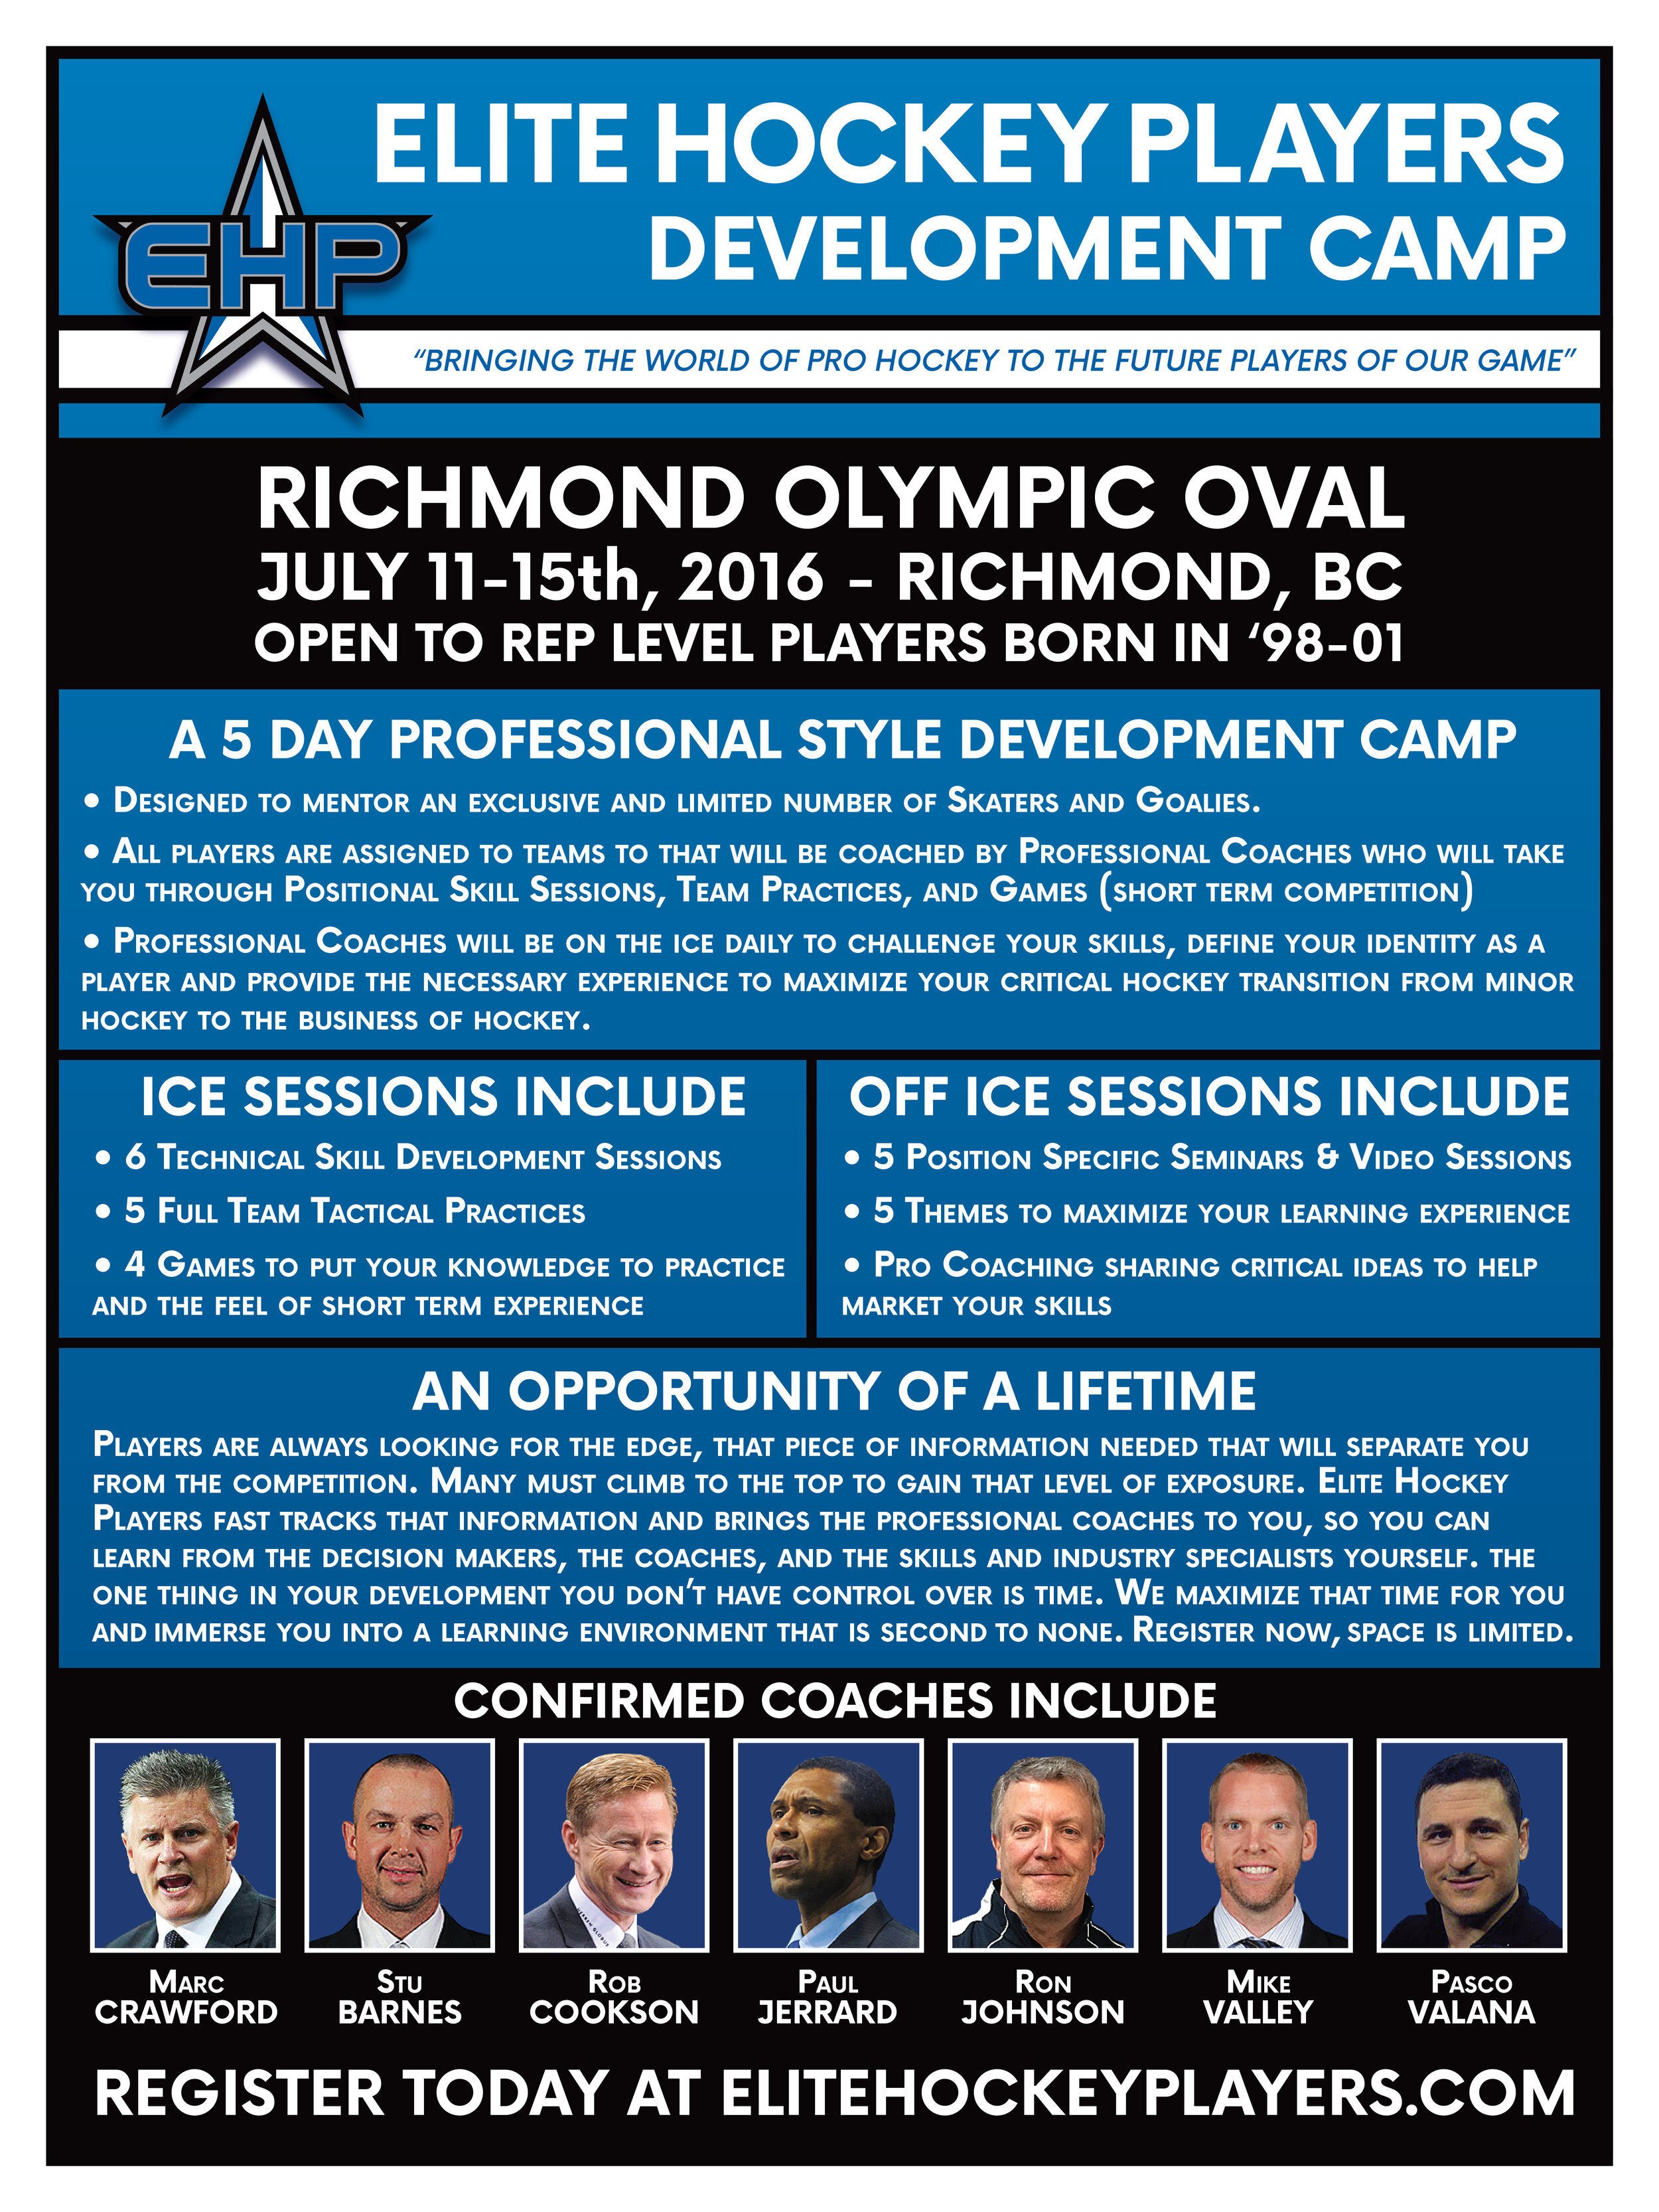 Elite Hockey Players Development Camp Poster